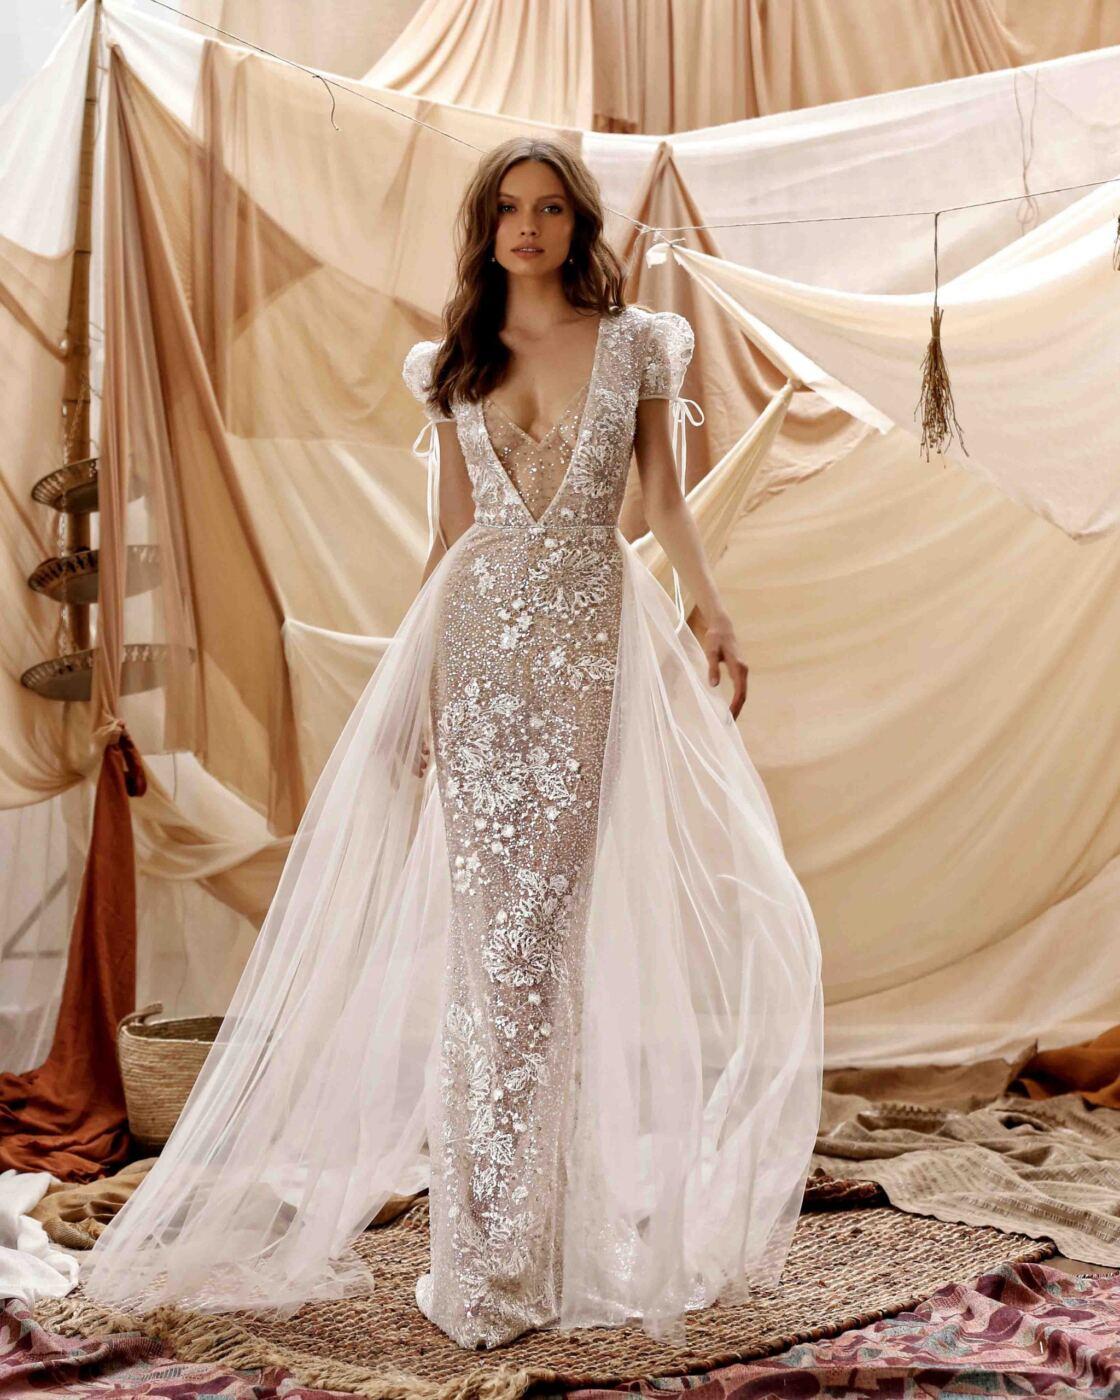 Berta Bridal Grmaine Dress 21-39-Grmaine.1-scaled